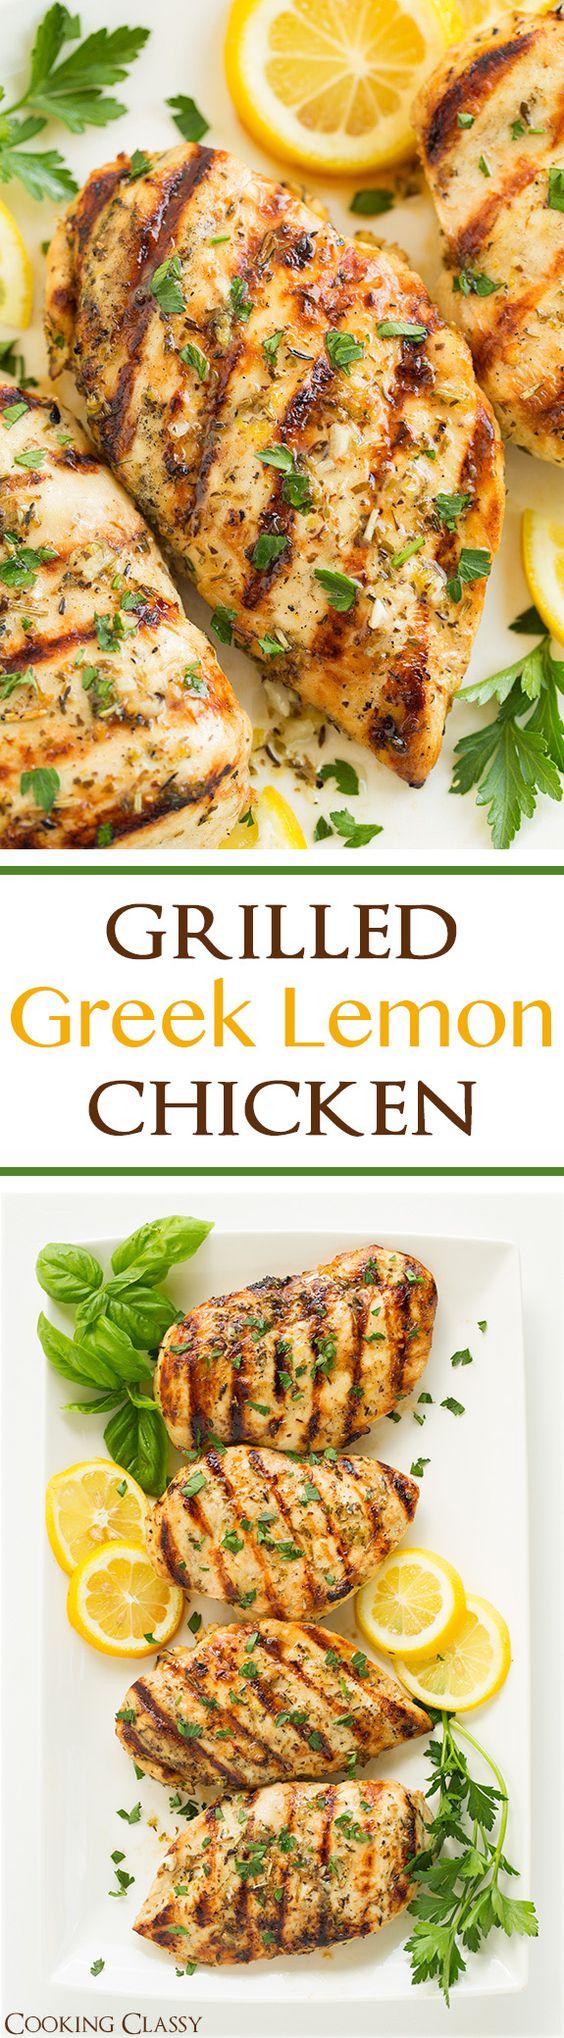 Grilled Greek Lemon Chicken Grilled Greek Lemon Chicken